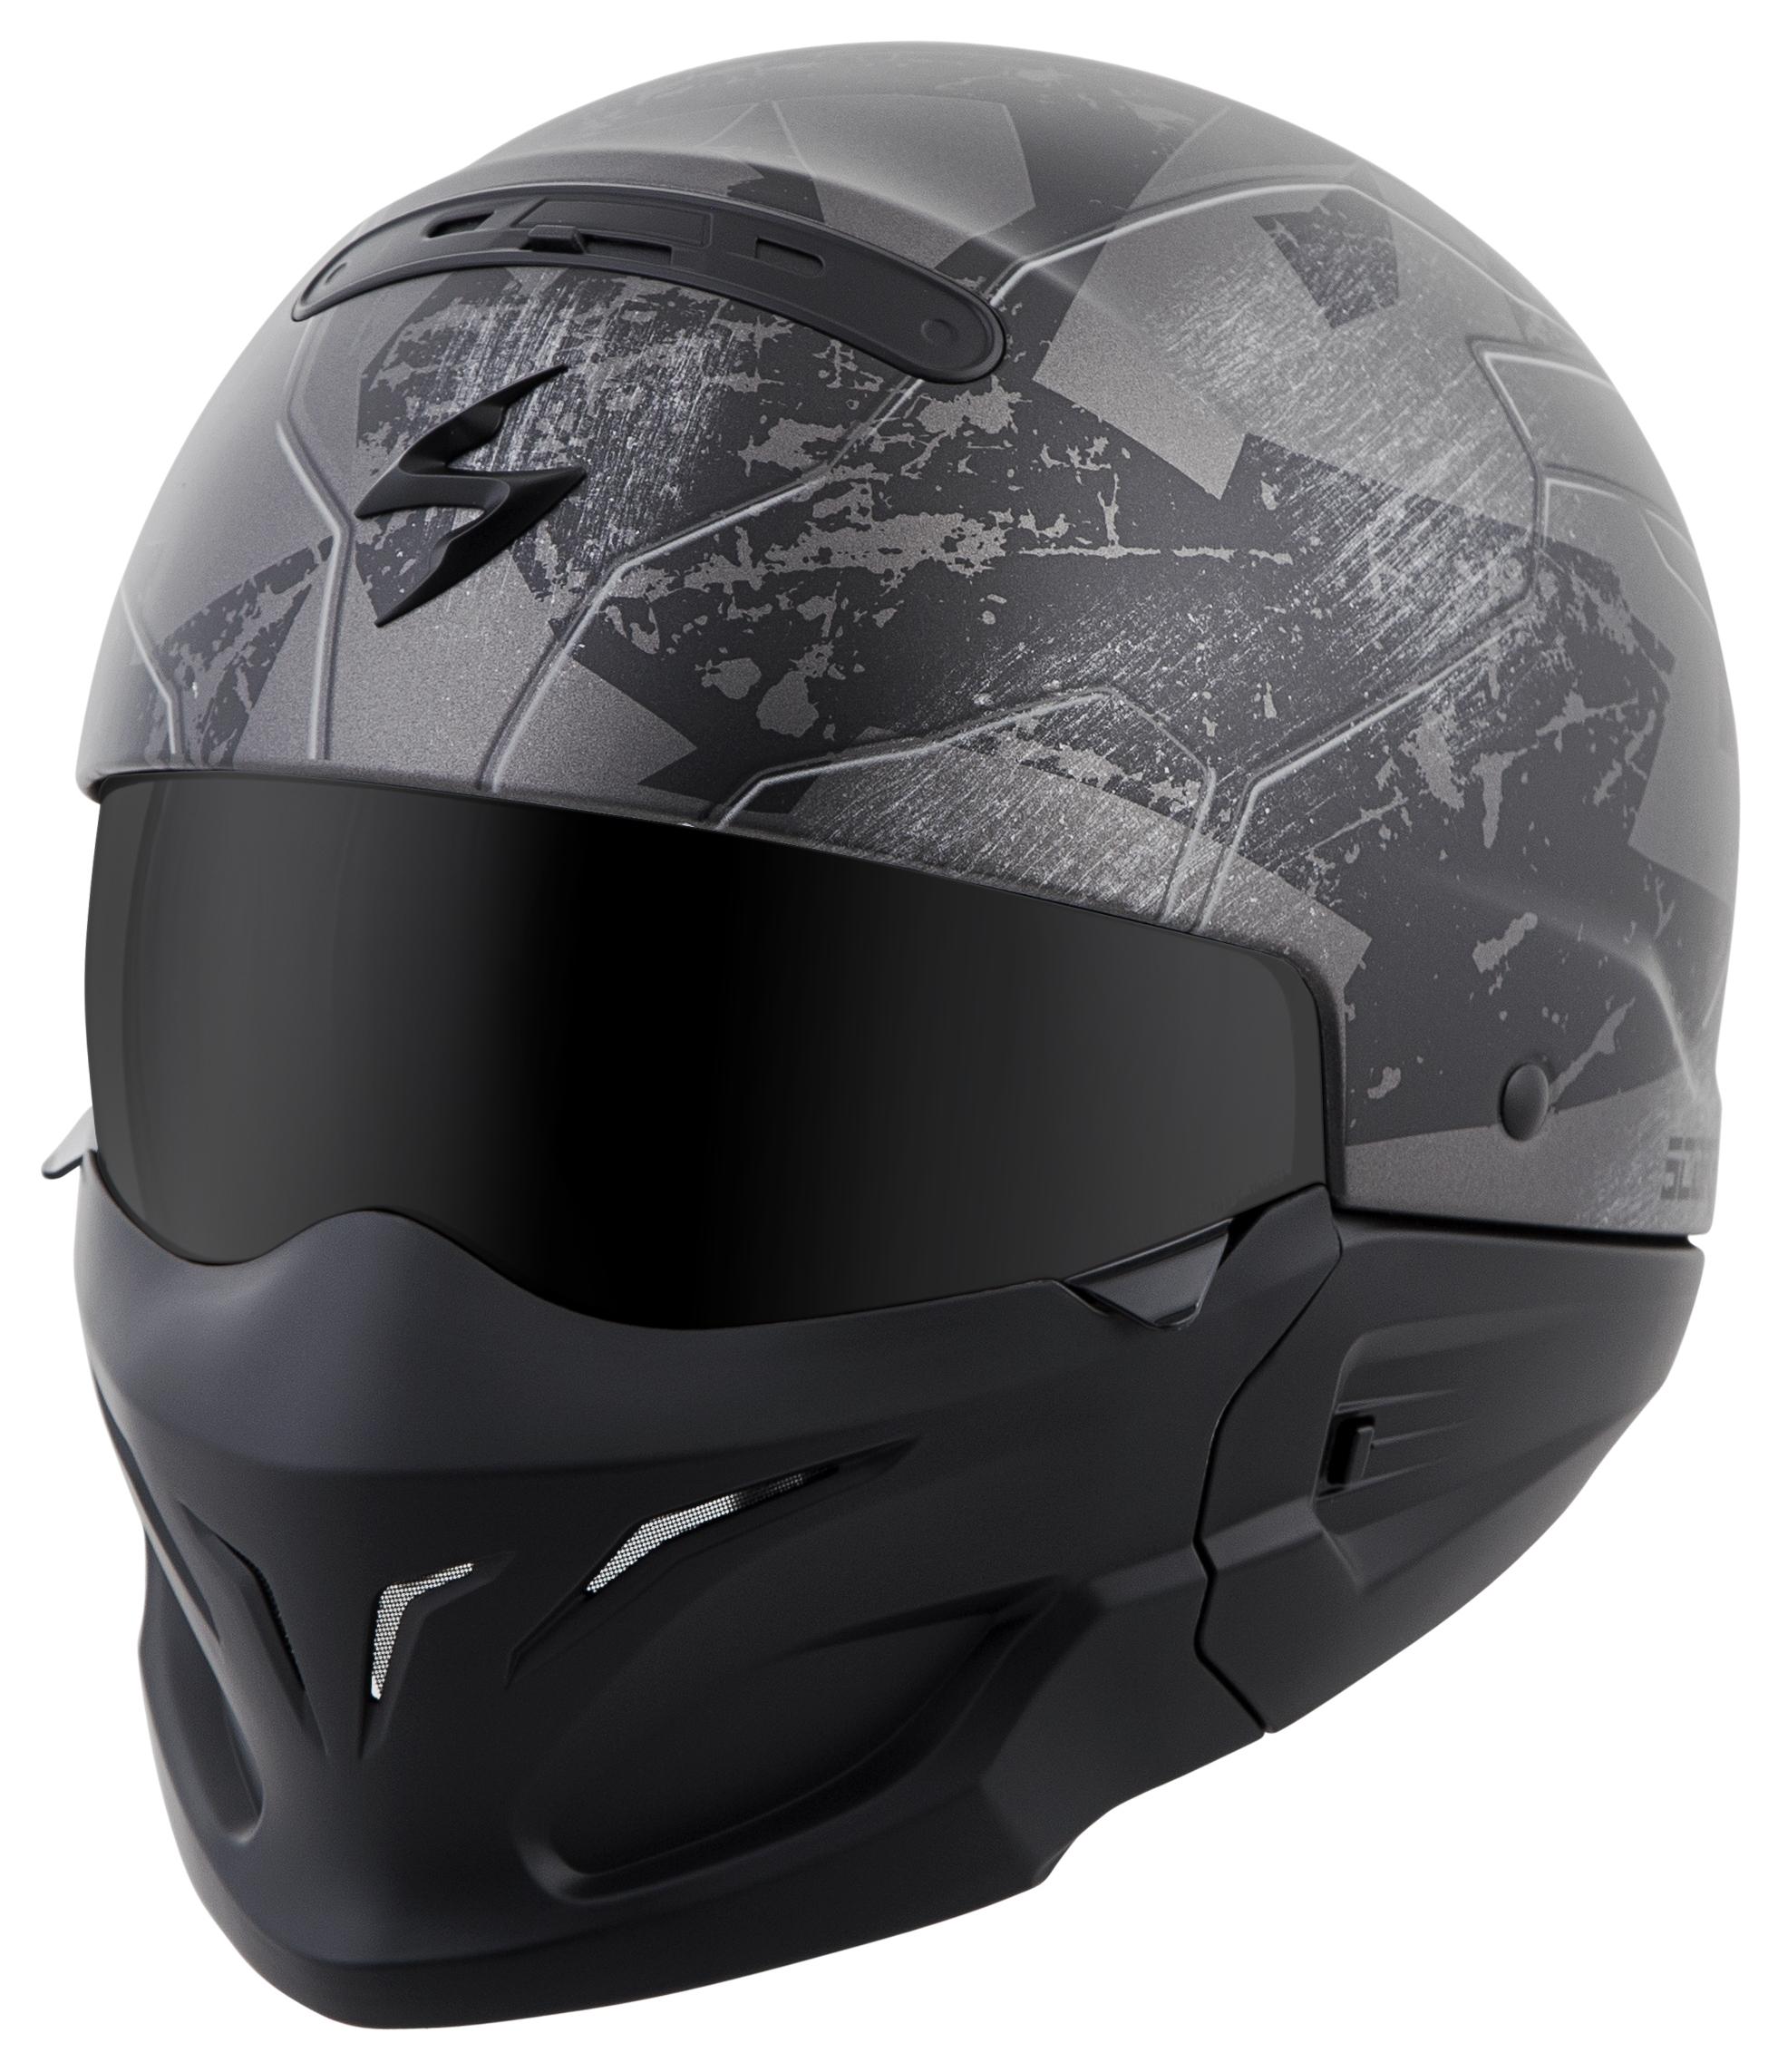 Scorpion Covert Ratnik Phantom Helmet 22 50 00 Off